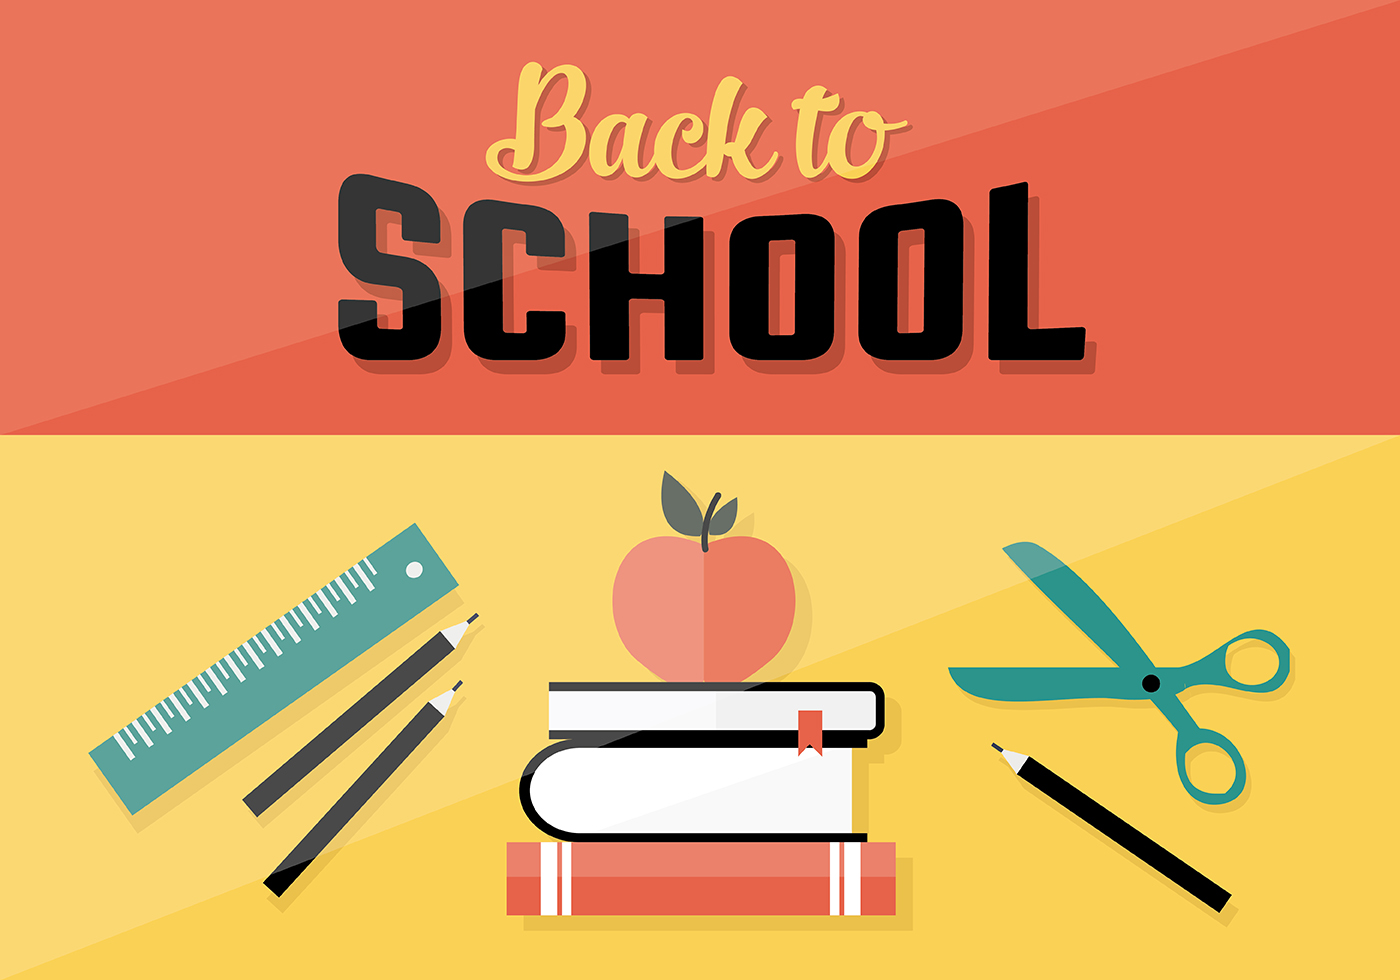 Back To School Vector Background Download Free Vector